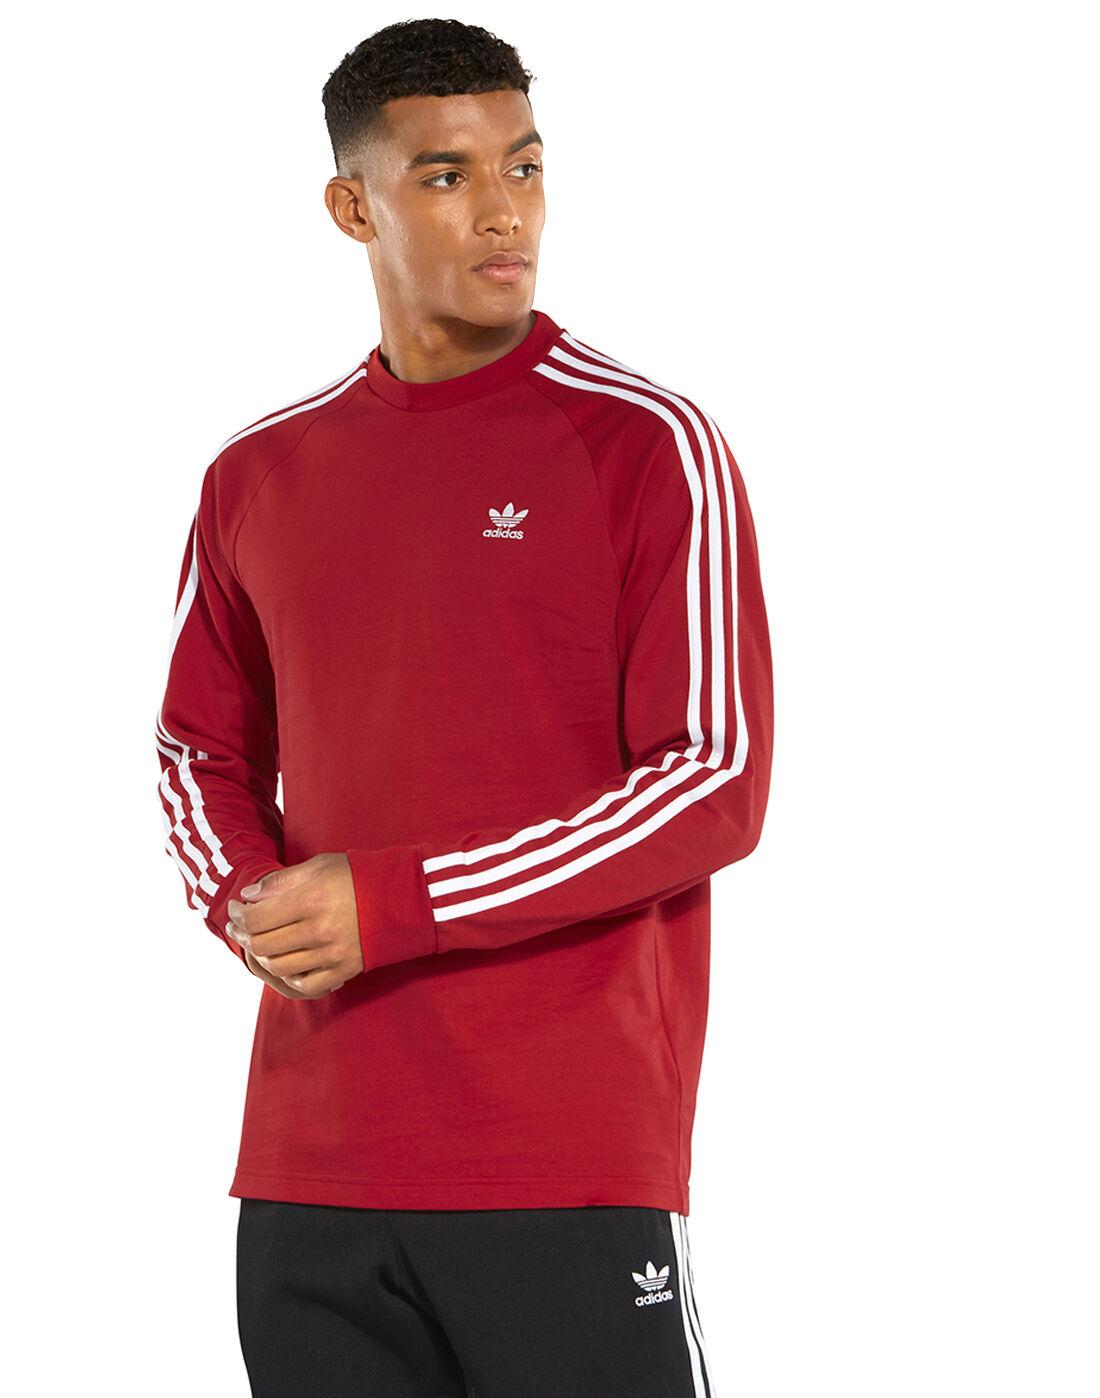 Men's Red Long Sleeve adidas Originals T-Shirt   Life Style Sports